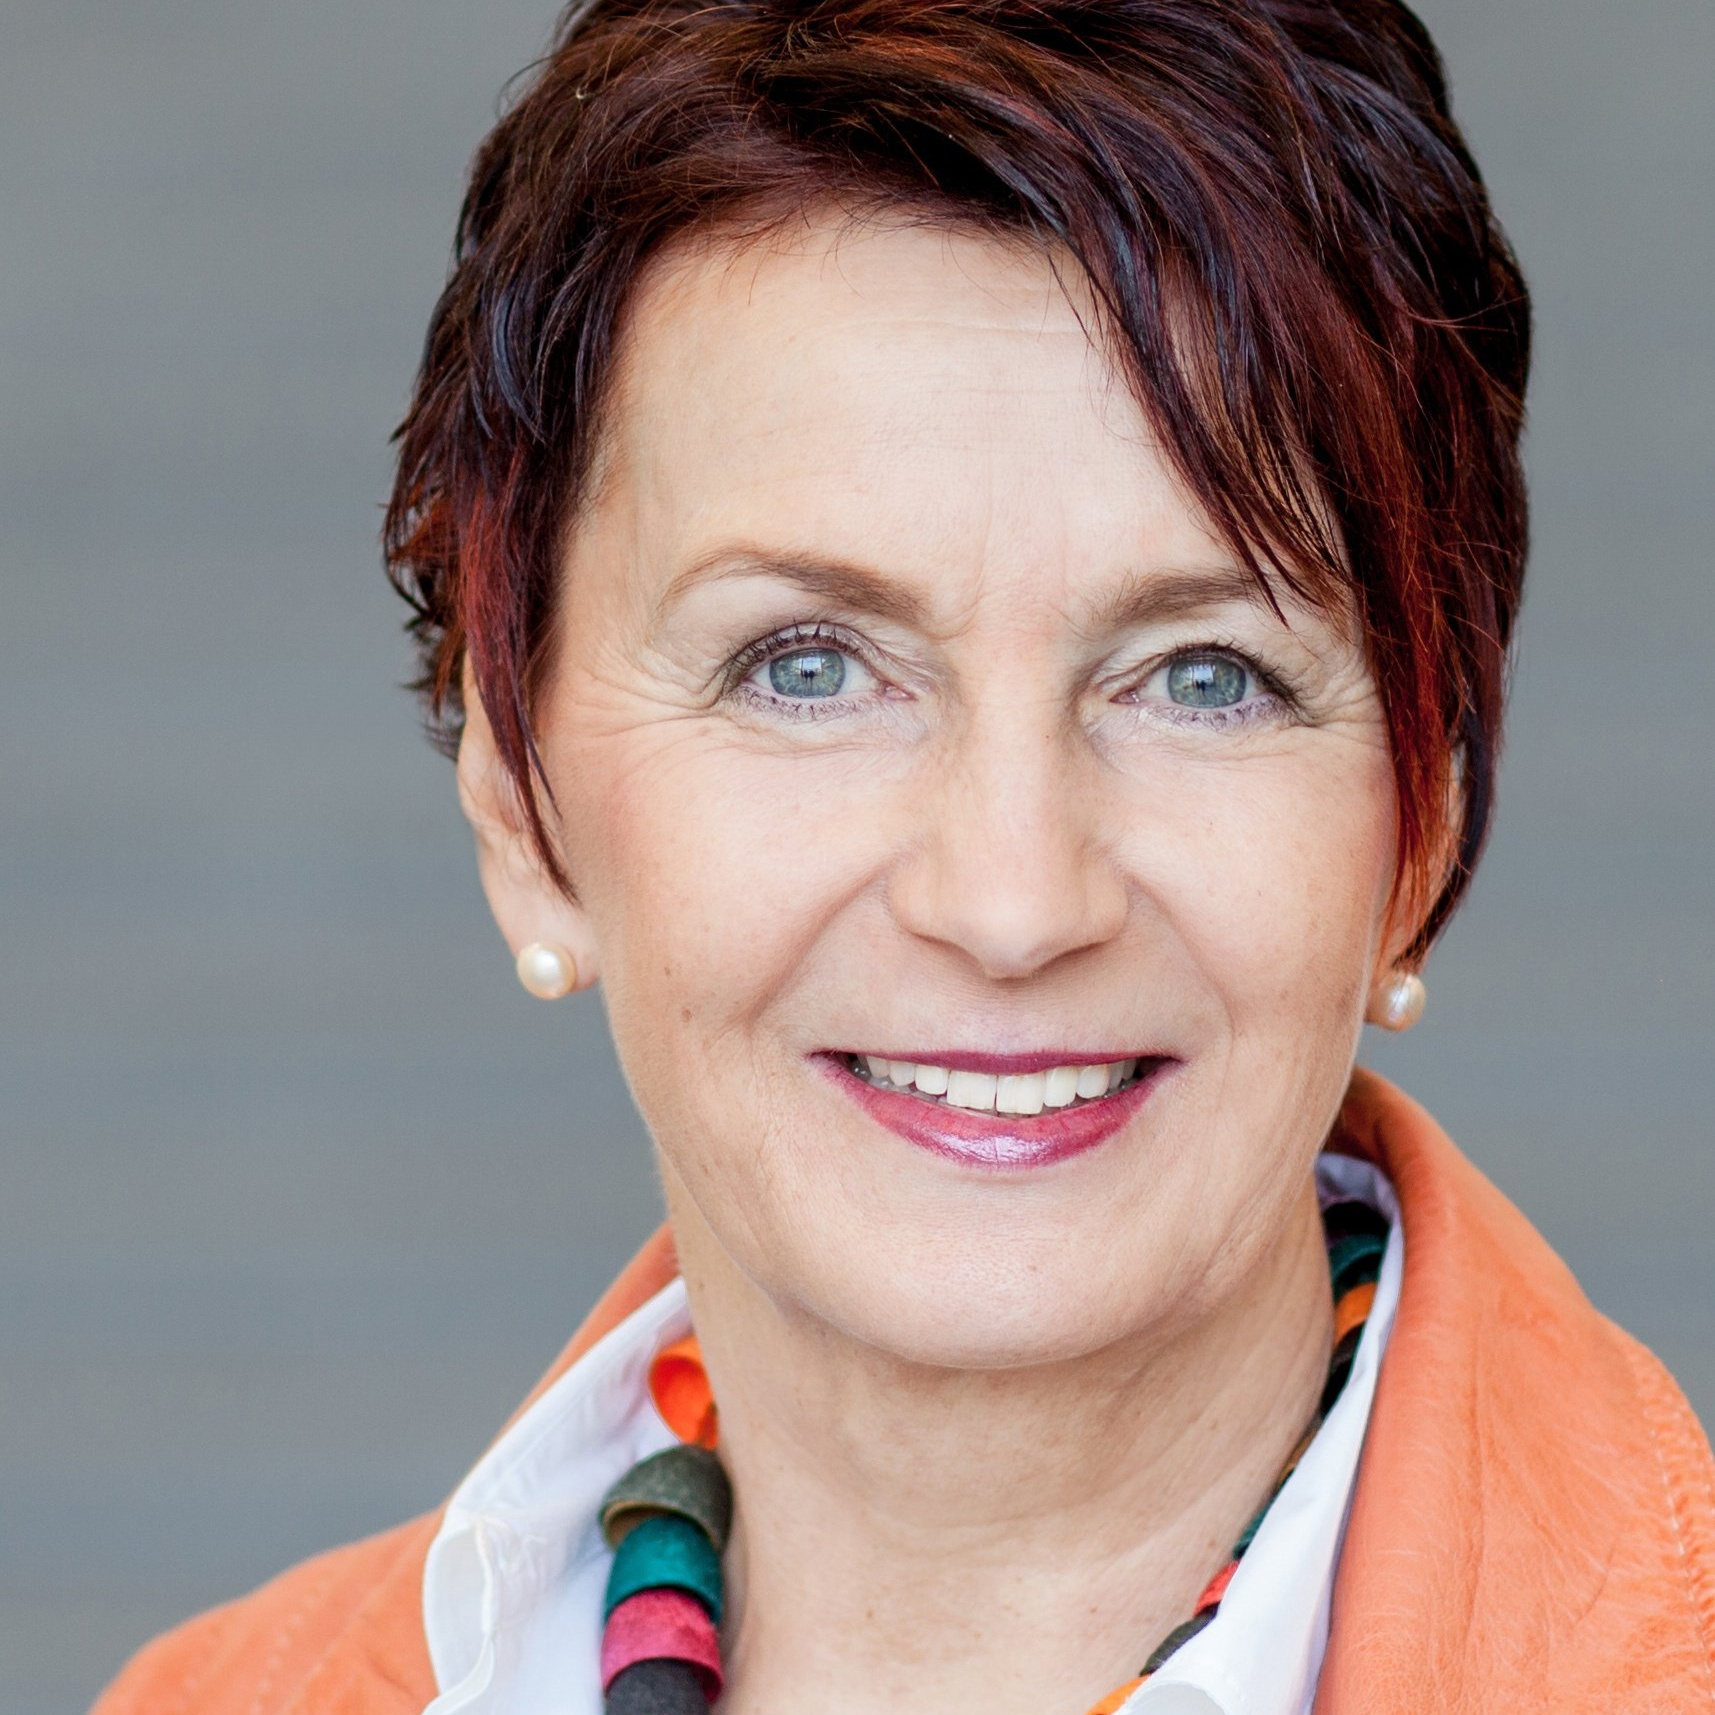 Monika Slomski